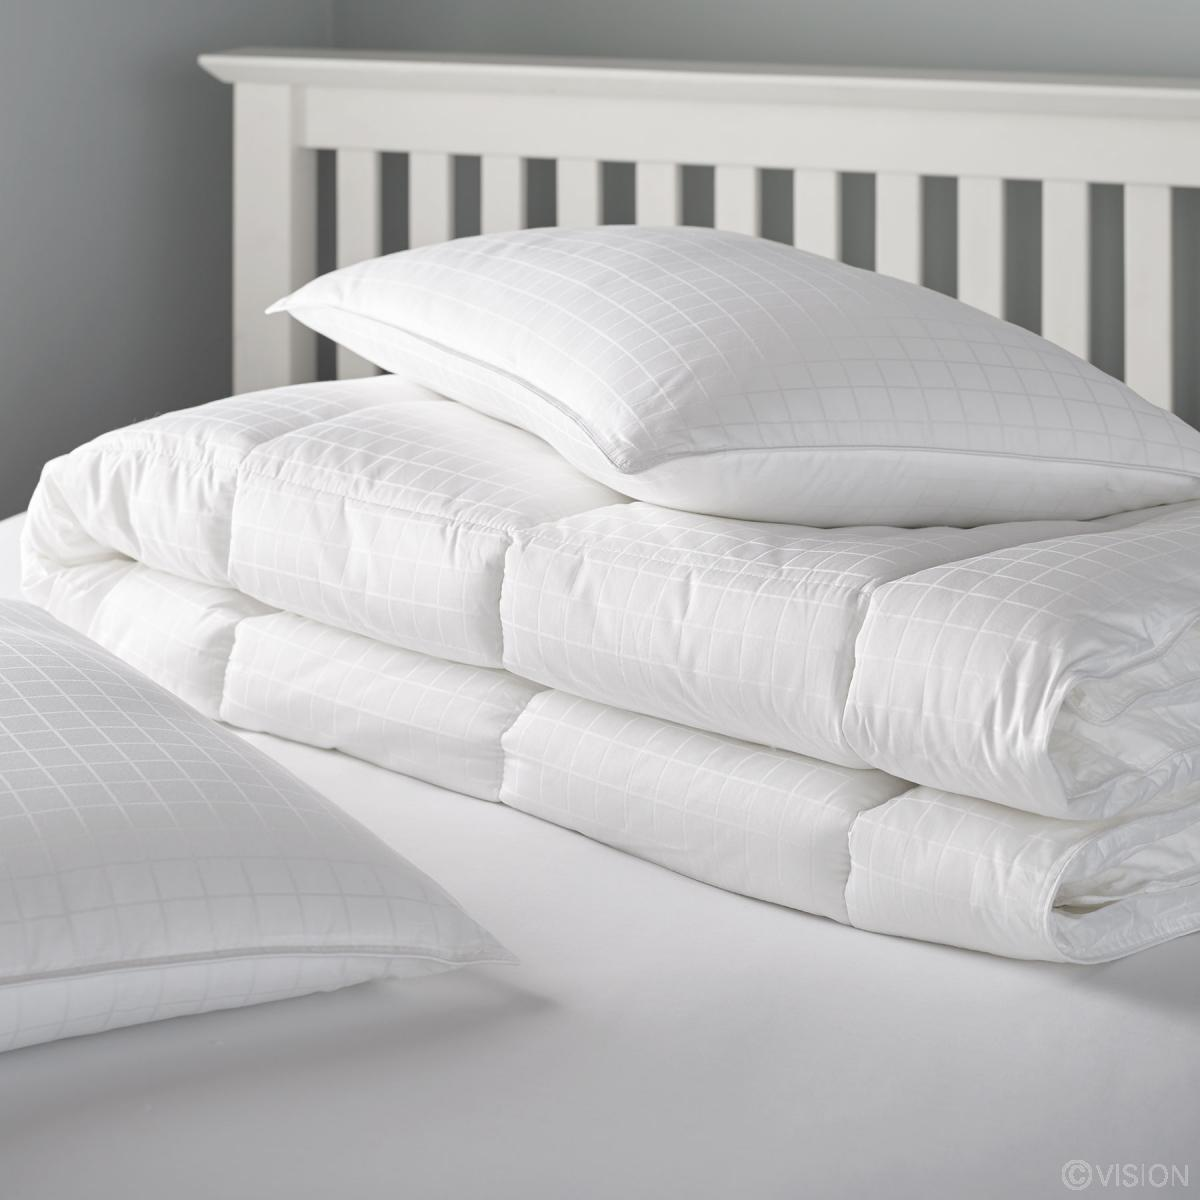 ritz rtz product down linens xlrg hotel duvet d shop m the bedding luxury carlton